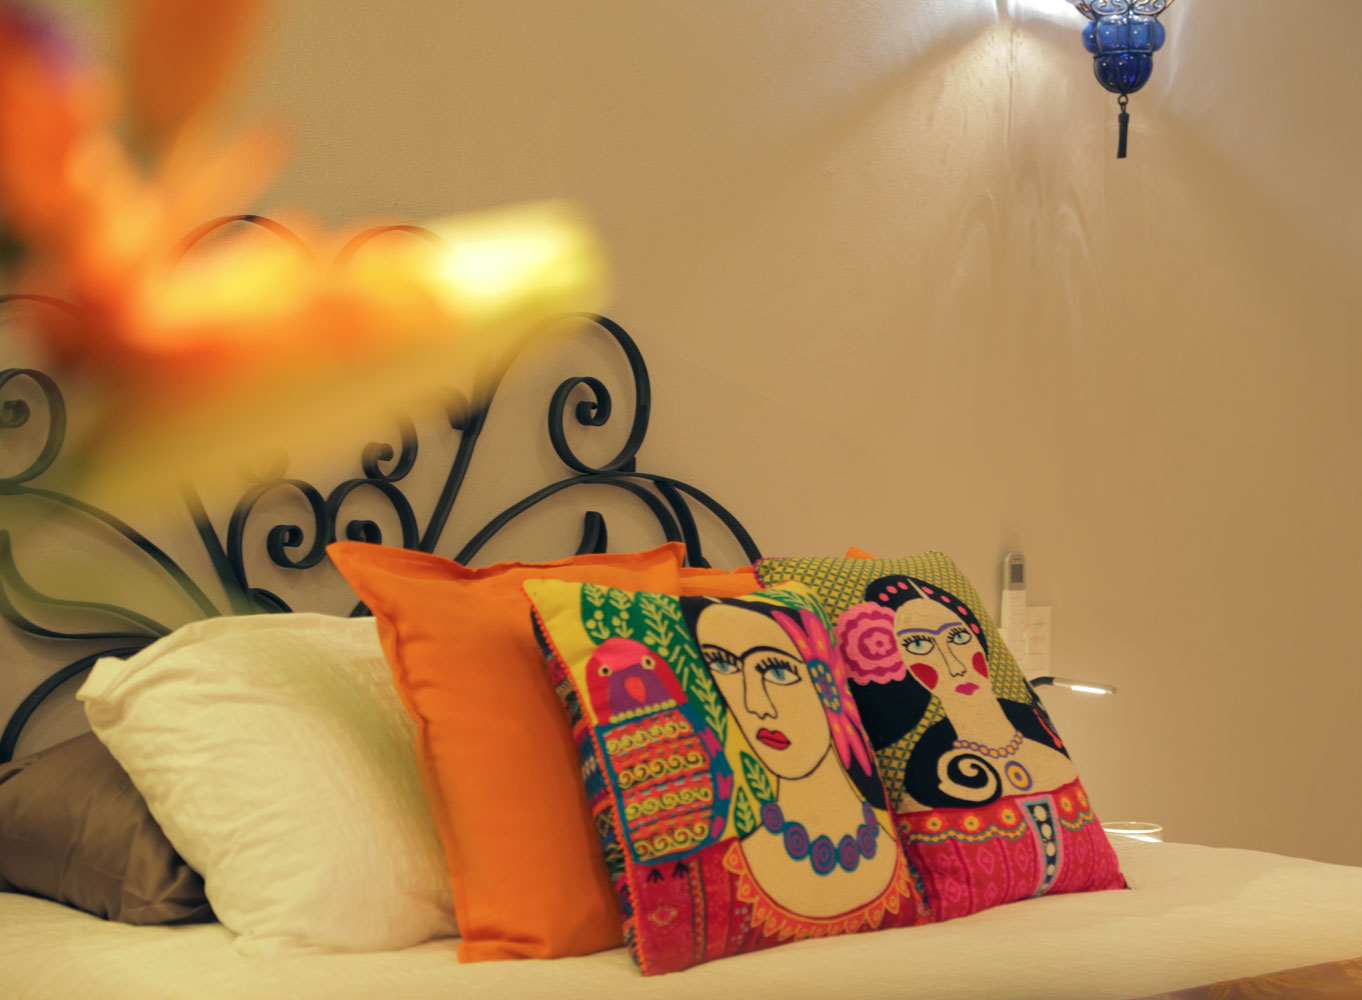 Casa-Joyero-Sayulita-bedroom-pillows-0101.jpg